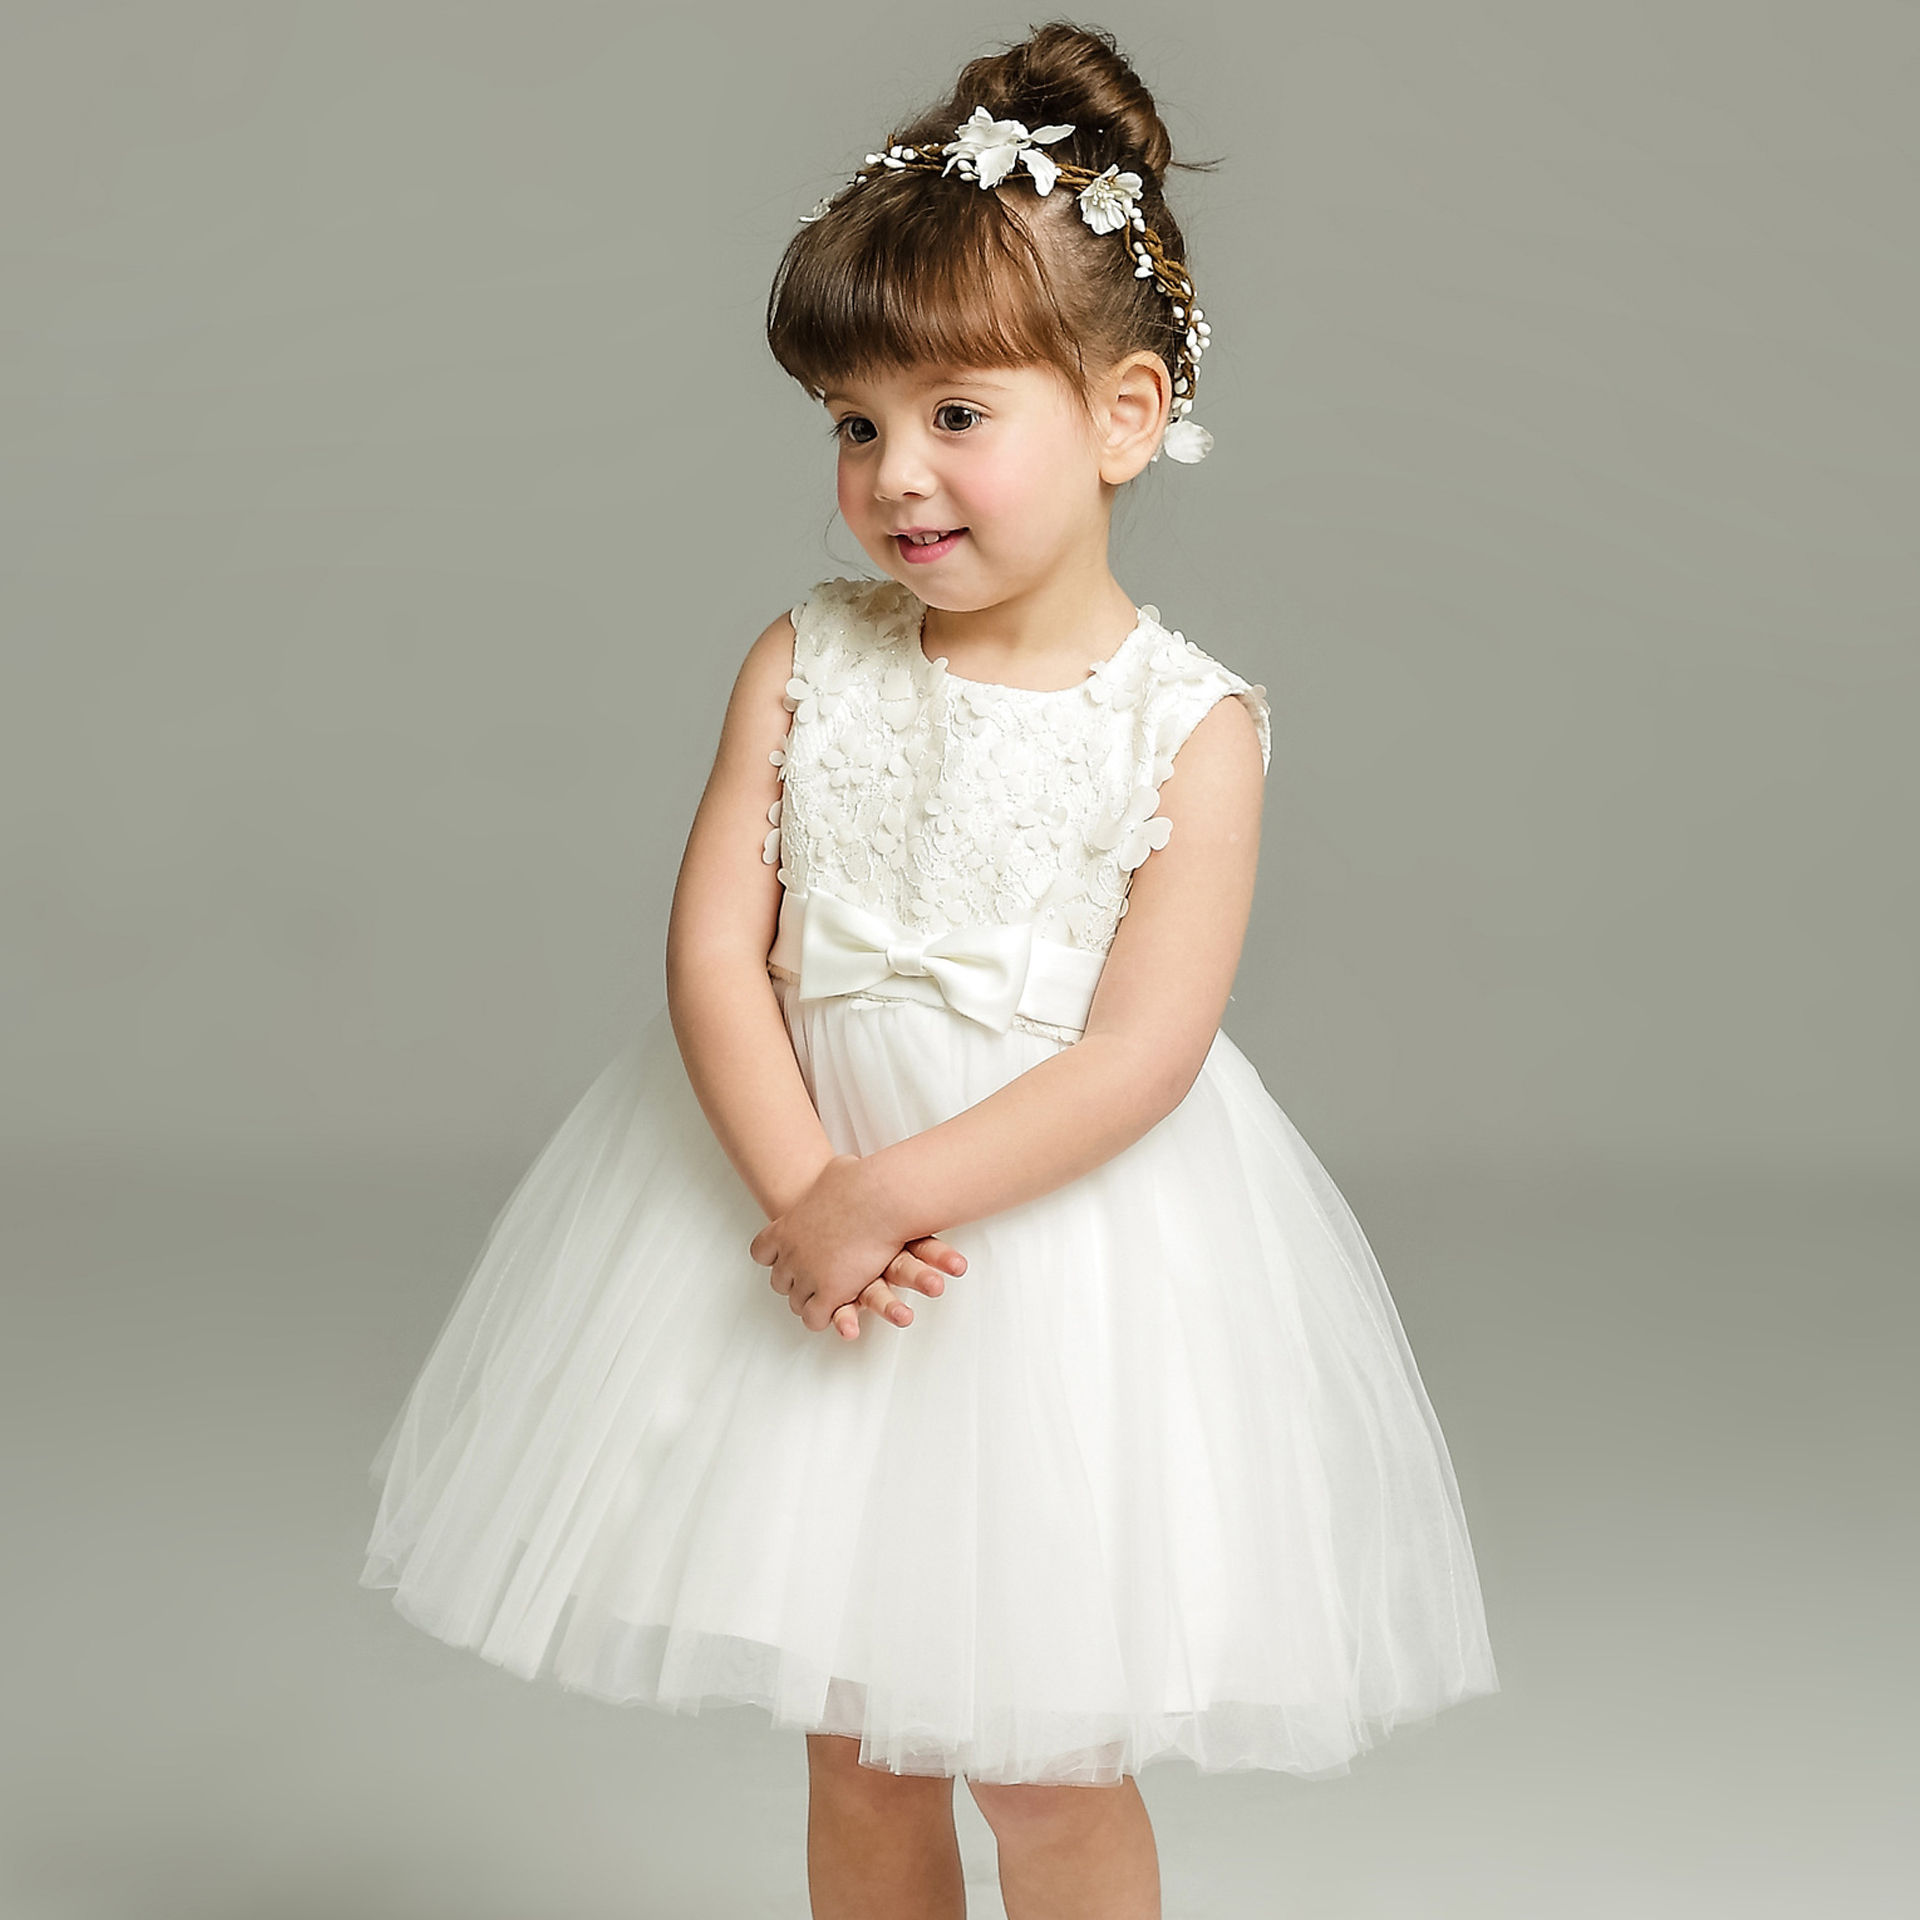 887611c111e Newborn Dress Baby Girl Christening Gowns Toddler Girls Formal Dress White  Lace Baptism Dress Baby Girl 1 Year Birthday Gift-in Dresses from Mother    Kids ...